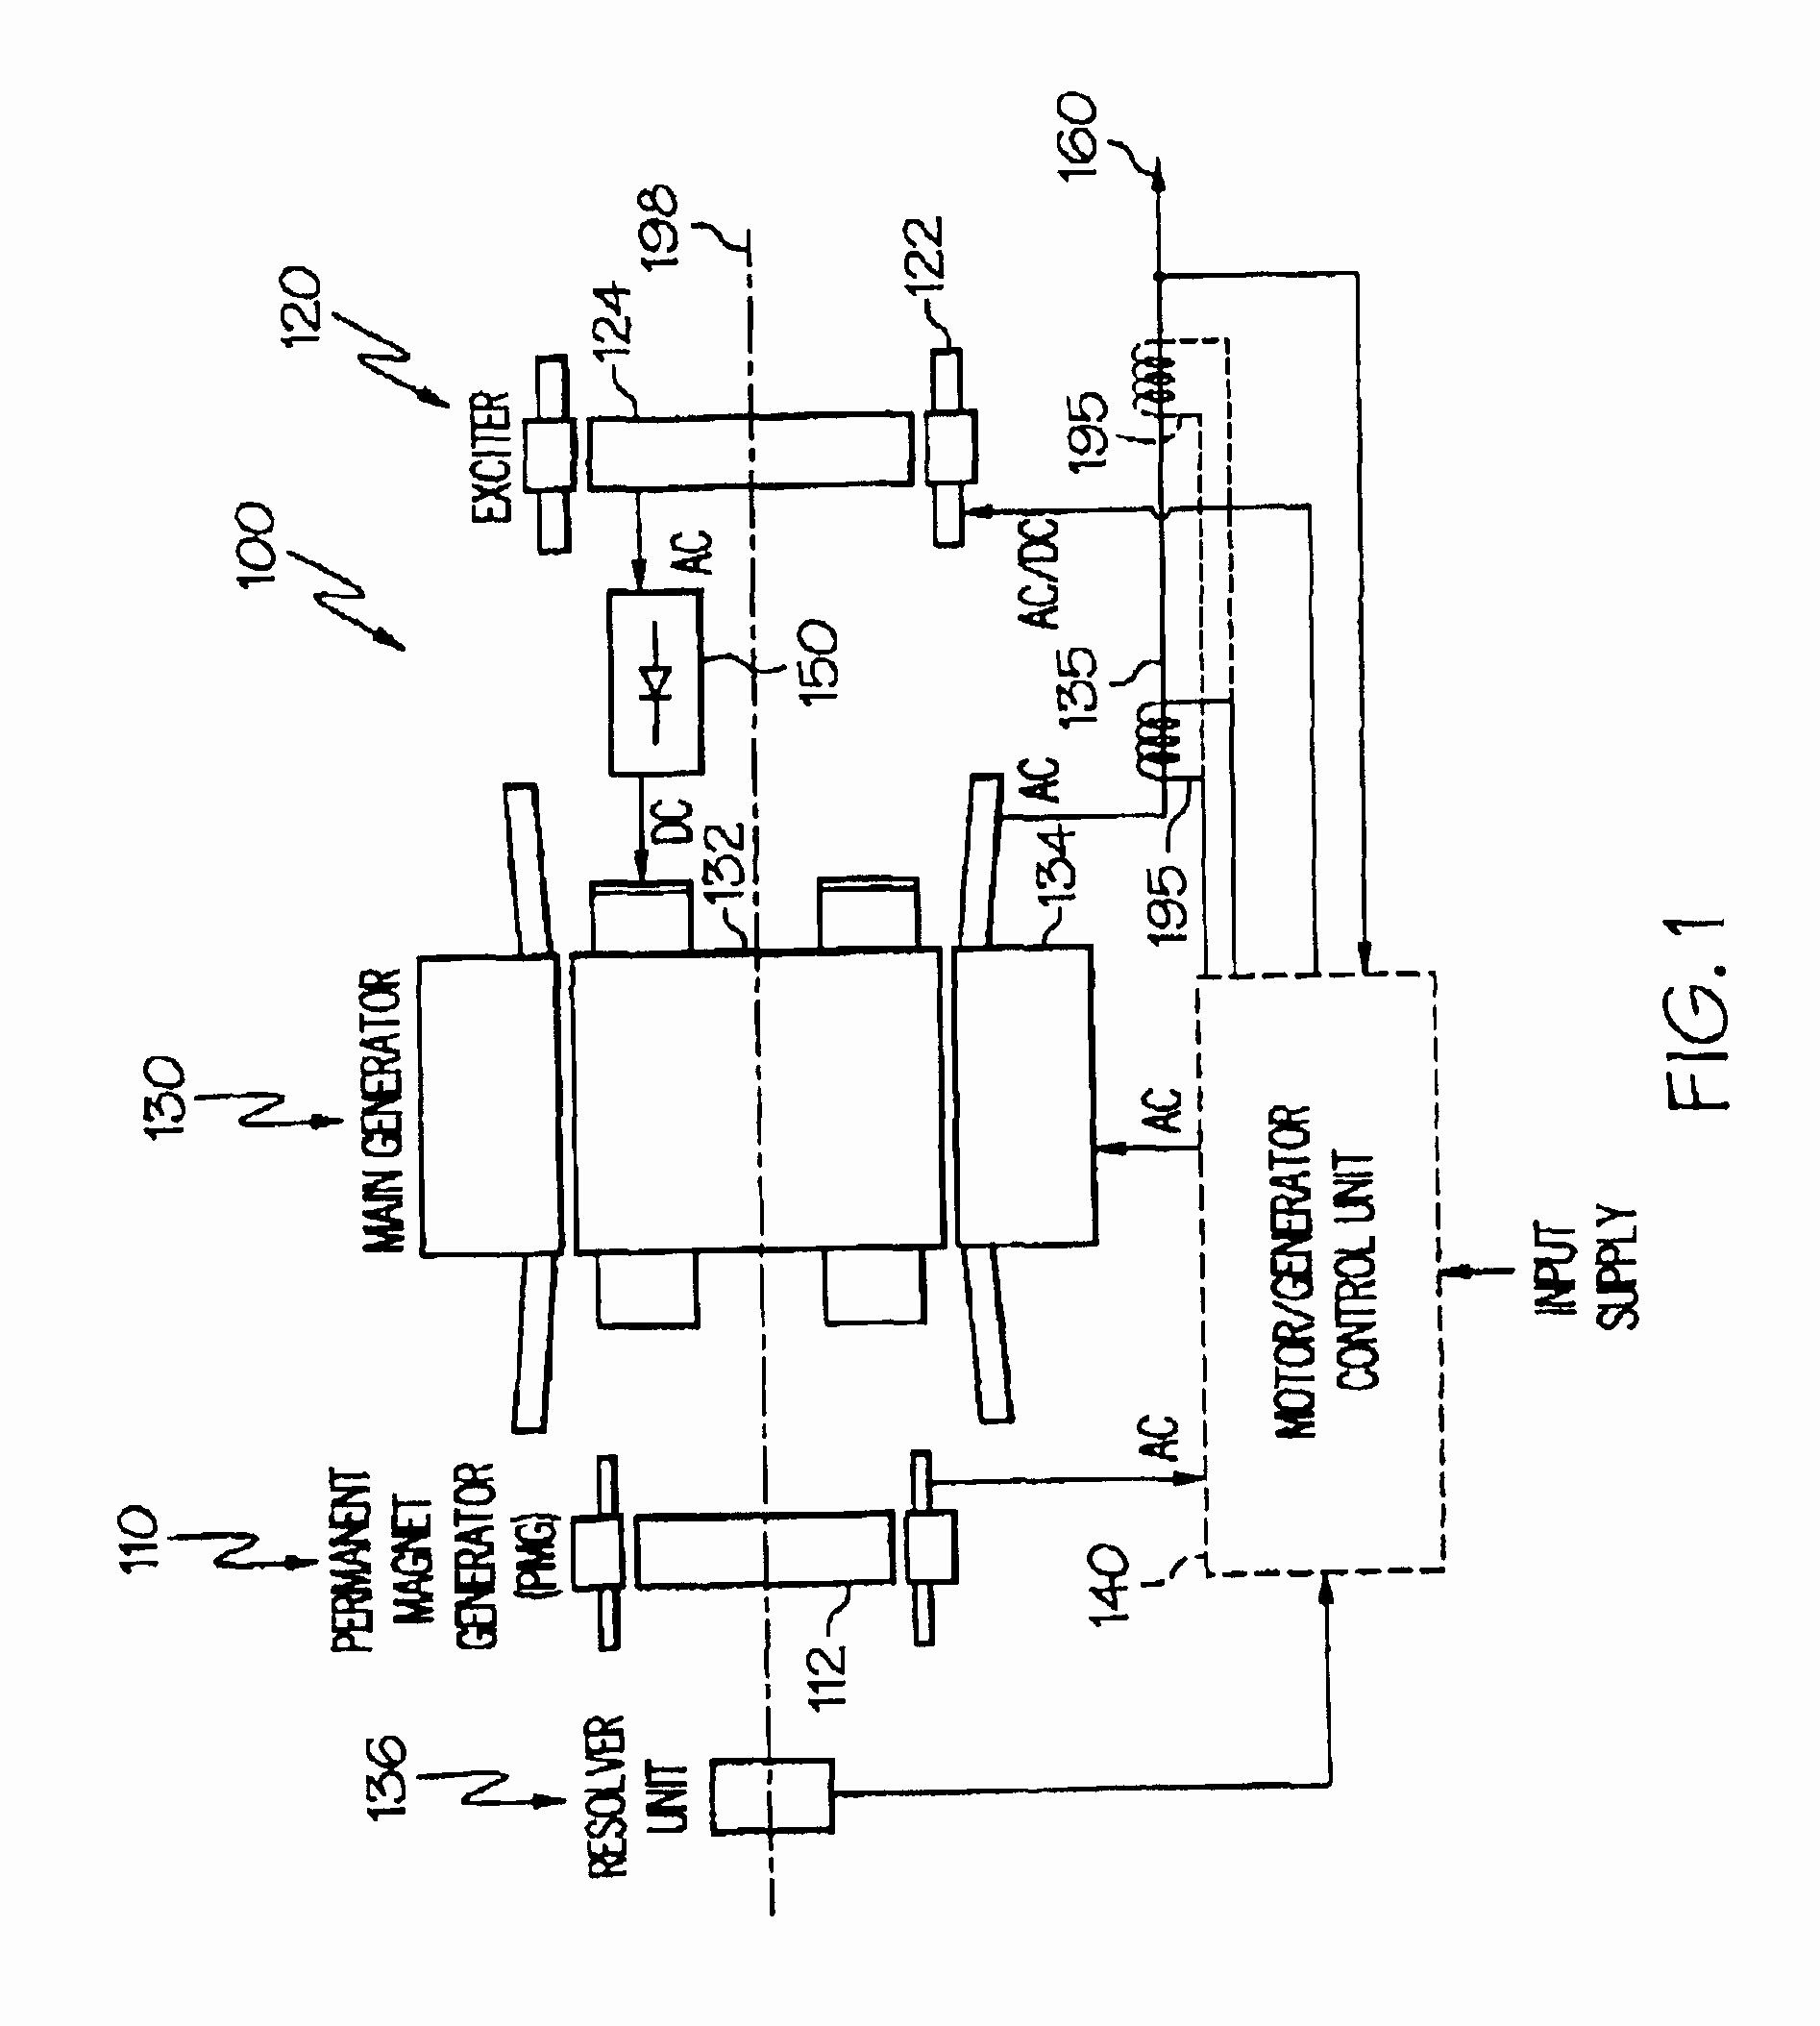 Onan Emerald 1 Wiring Diagram | Wiring Library - Onan Emerald 1 Genset Wiring Diagram